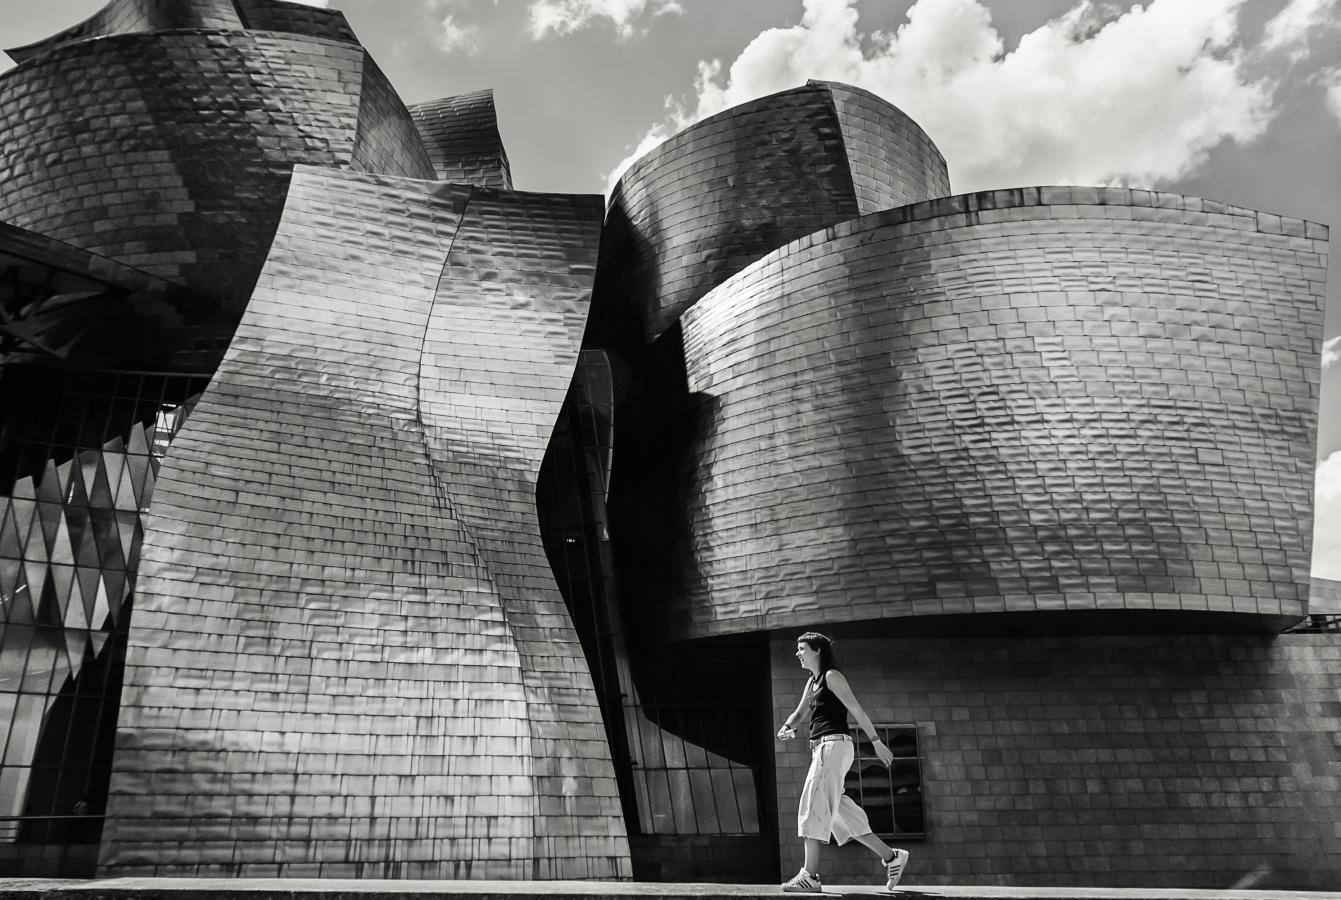 Guggenheim-Bilbao-2